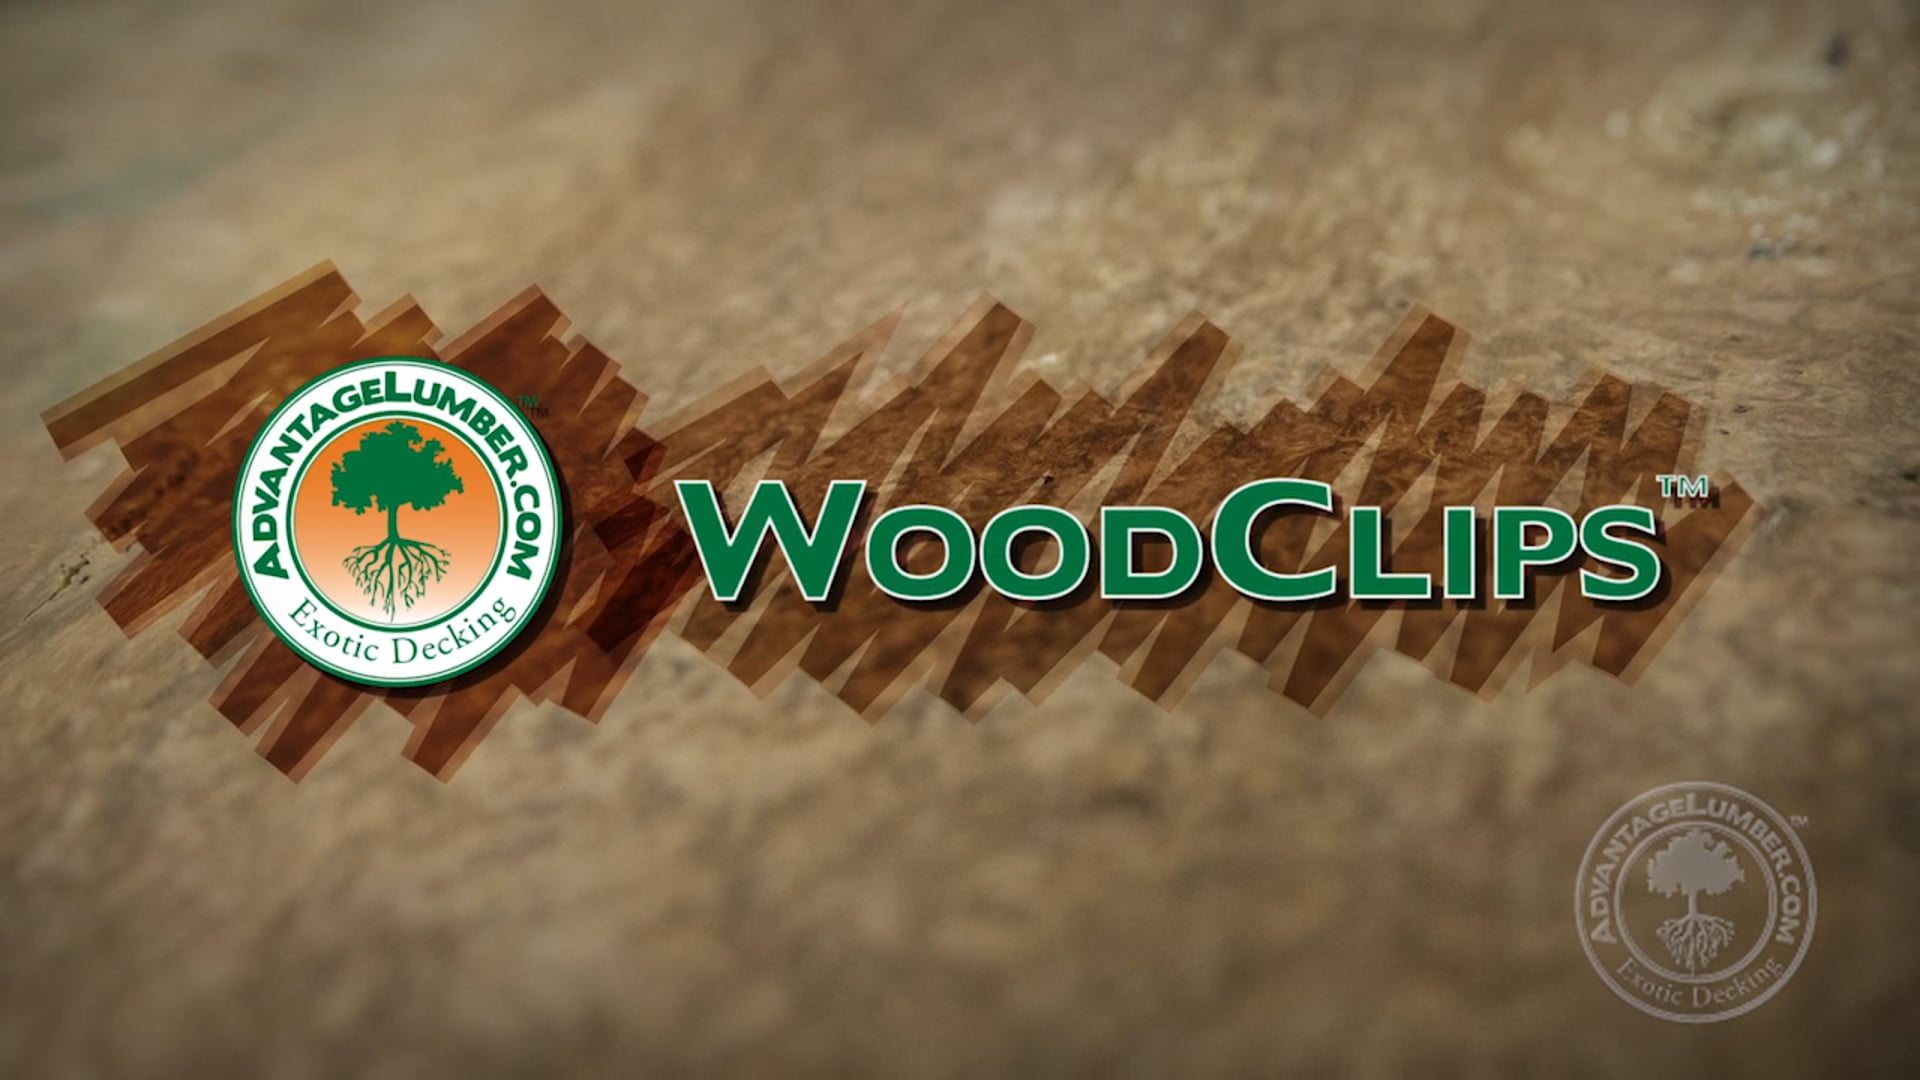 WoodClips: Wood Mizer Workings